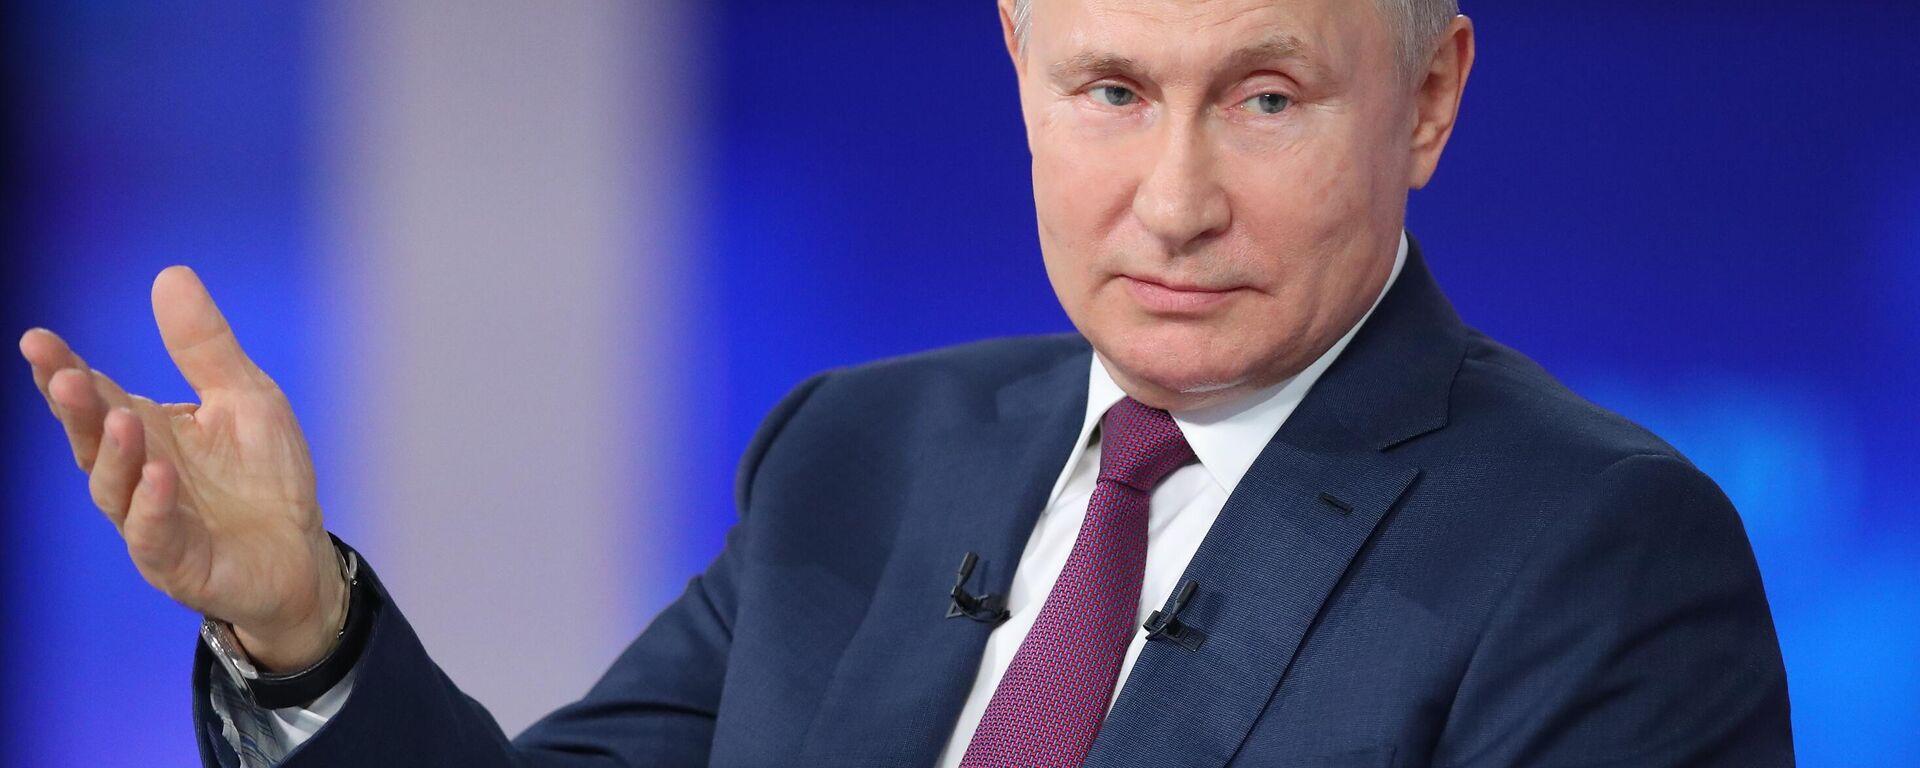 Línea directa con Vladímir Putin 2021 - Sputnik Mundo, 1920, 20.07.2021